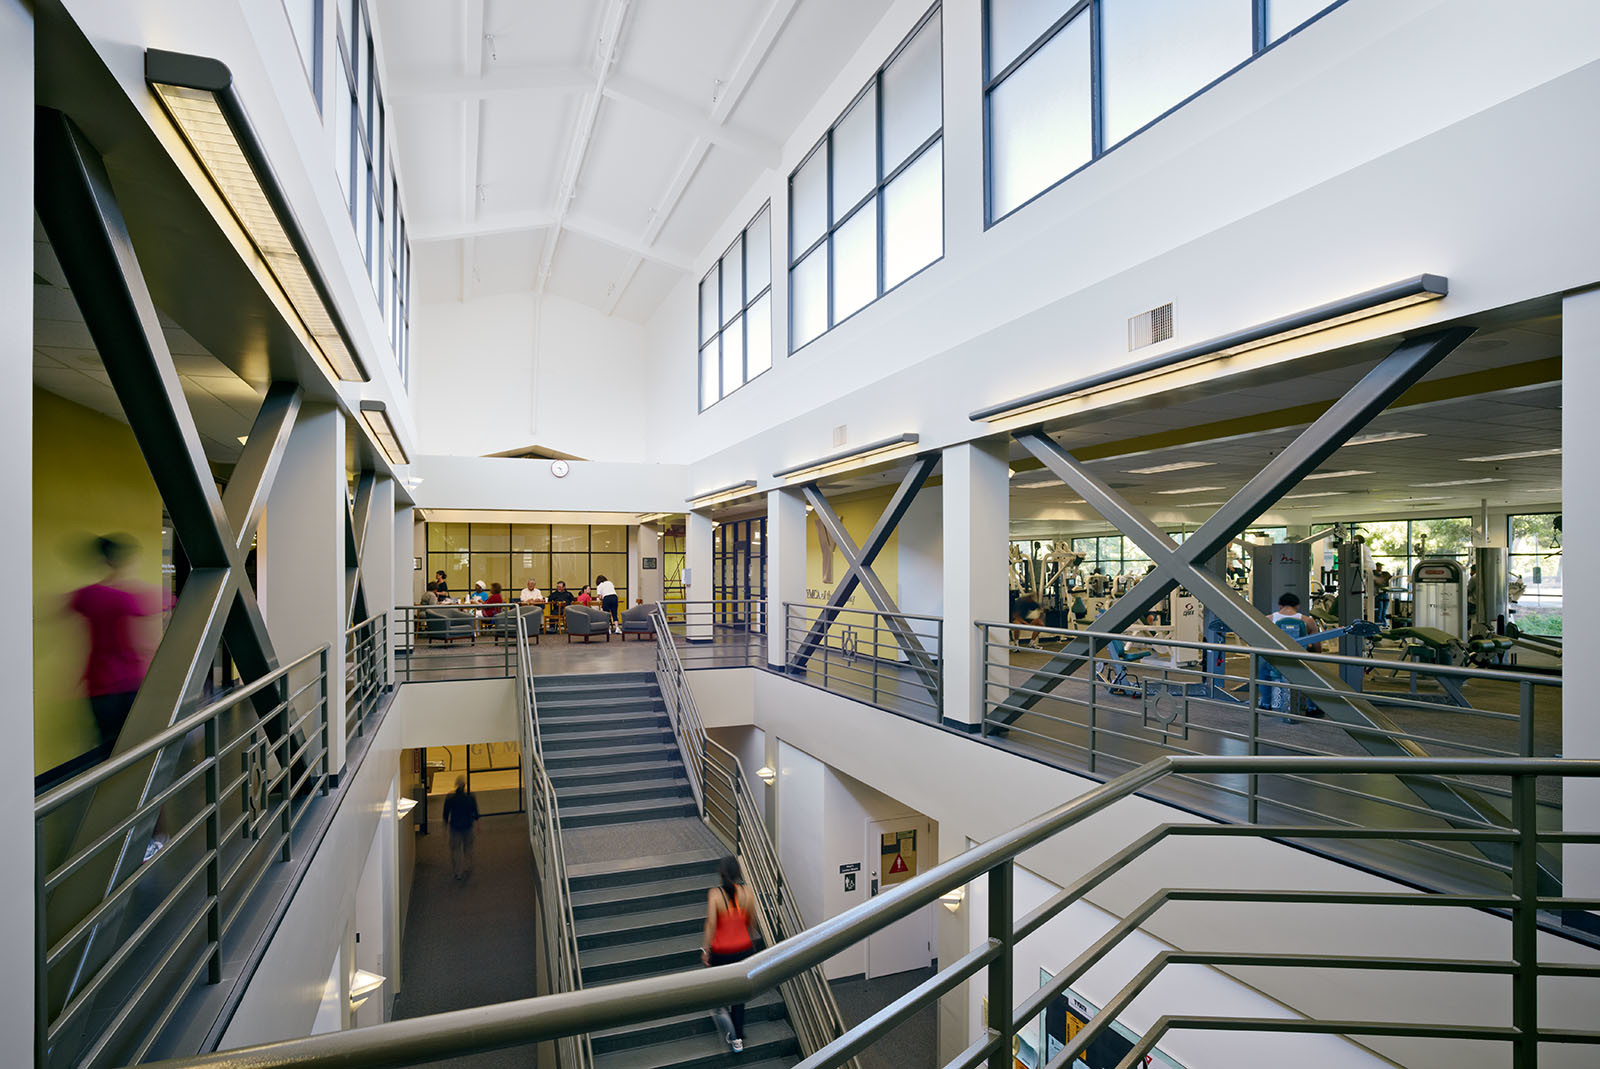 Atrium view Hilltop Family YMCA Richmond, CA fitness facility renovation ©brick-inc